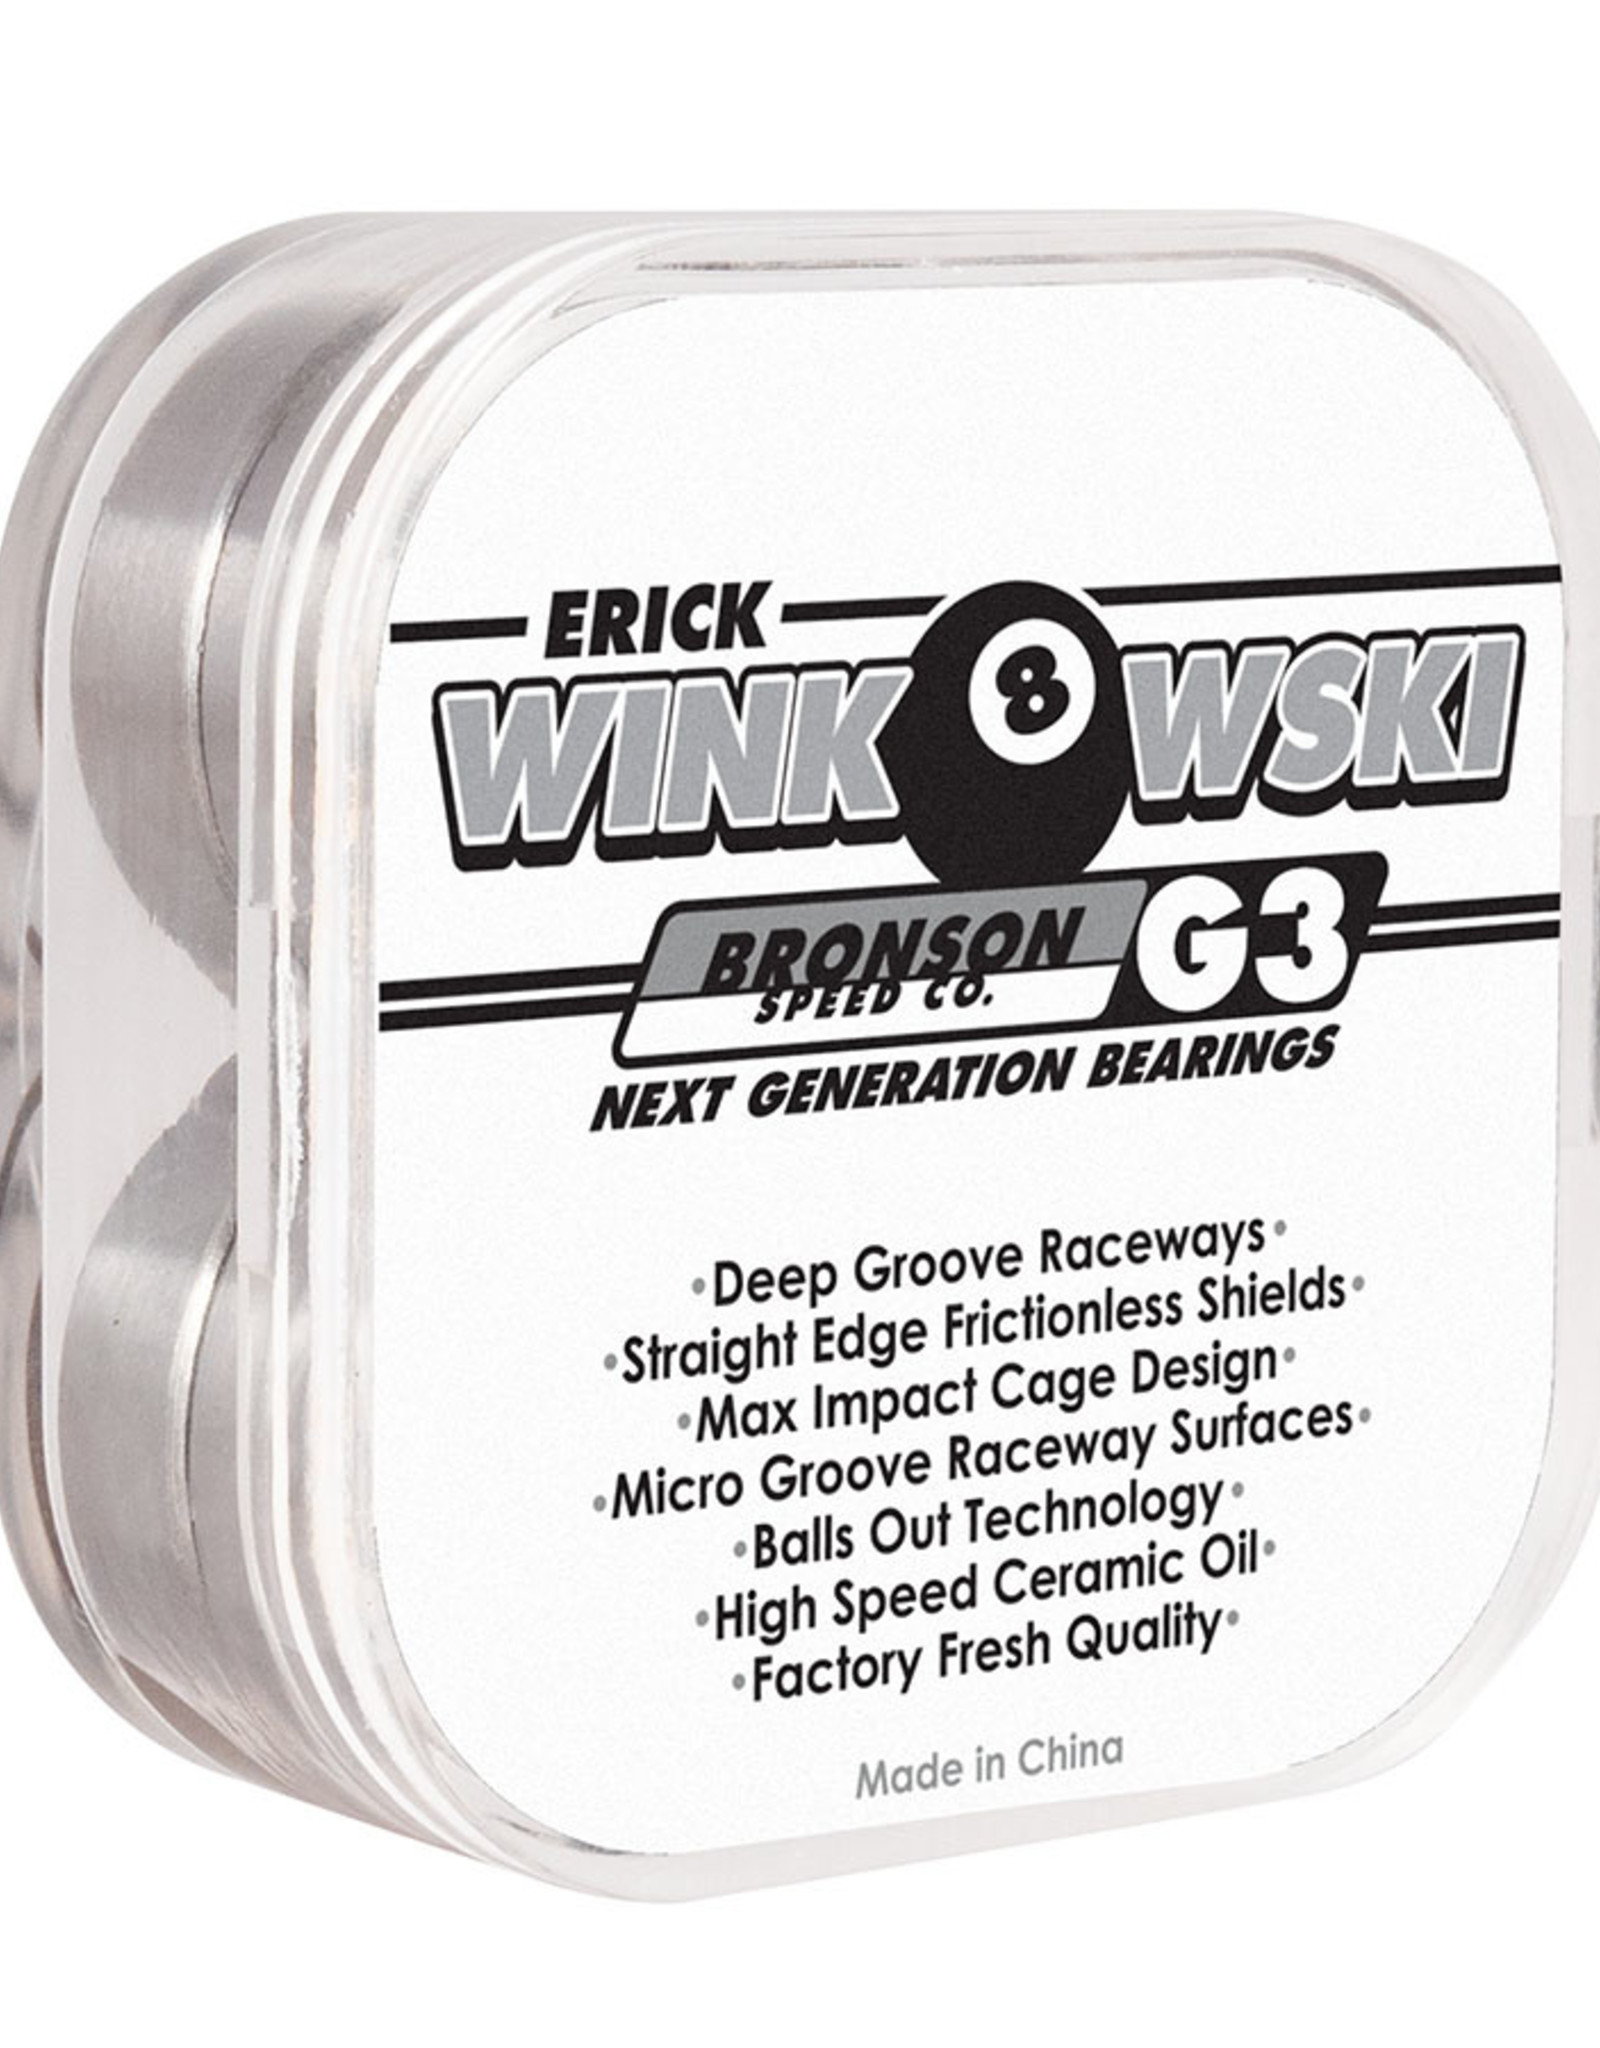 Bronson BRONSON PRO BEARING G3 ERICK WINKOWSKI